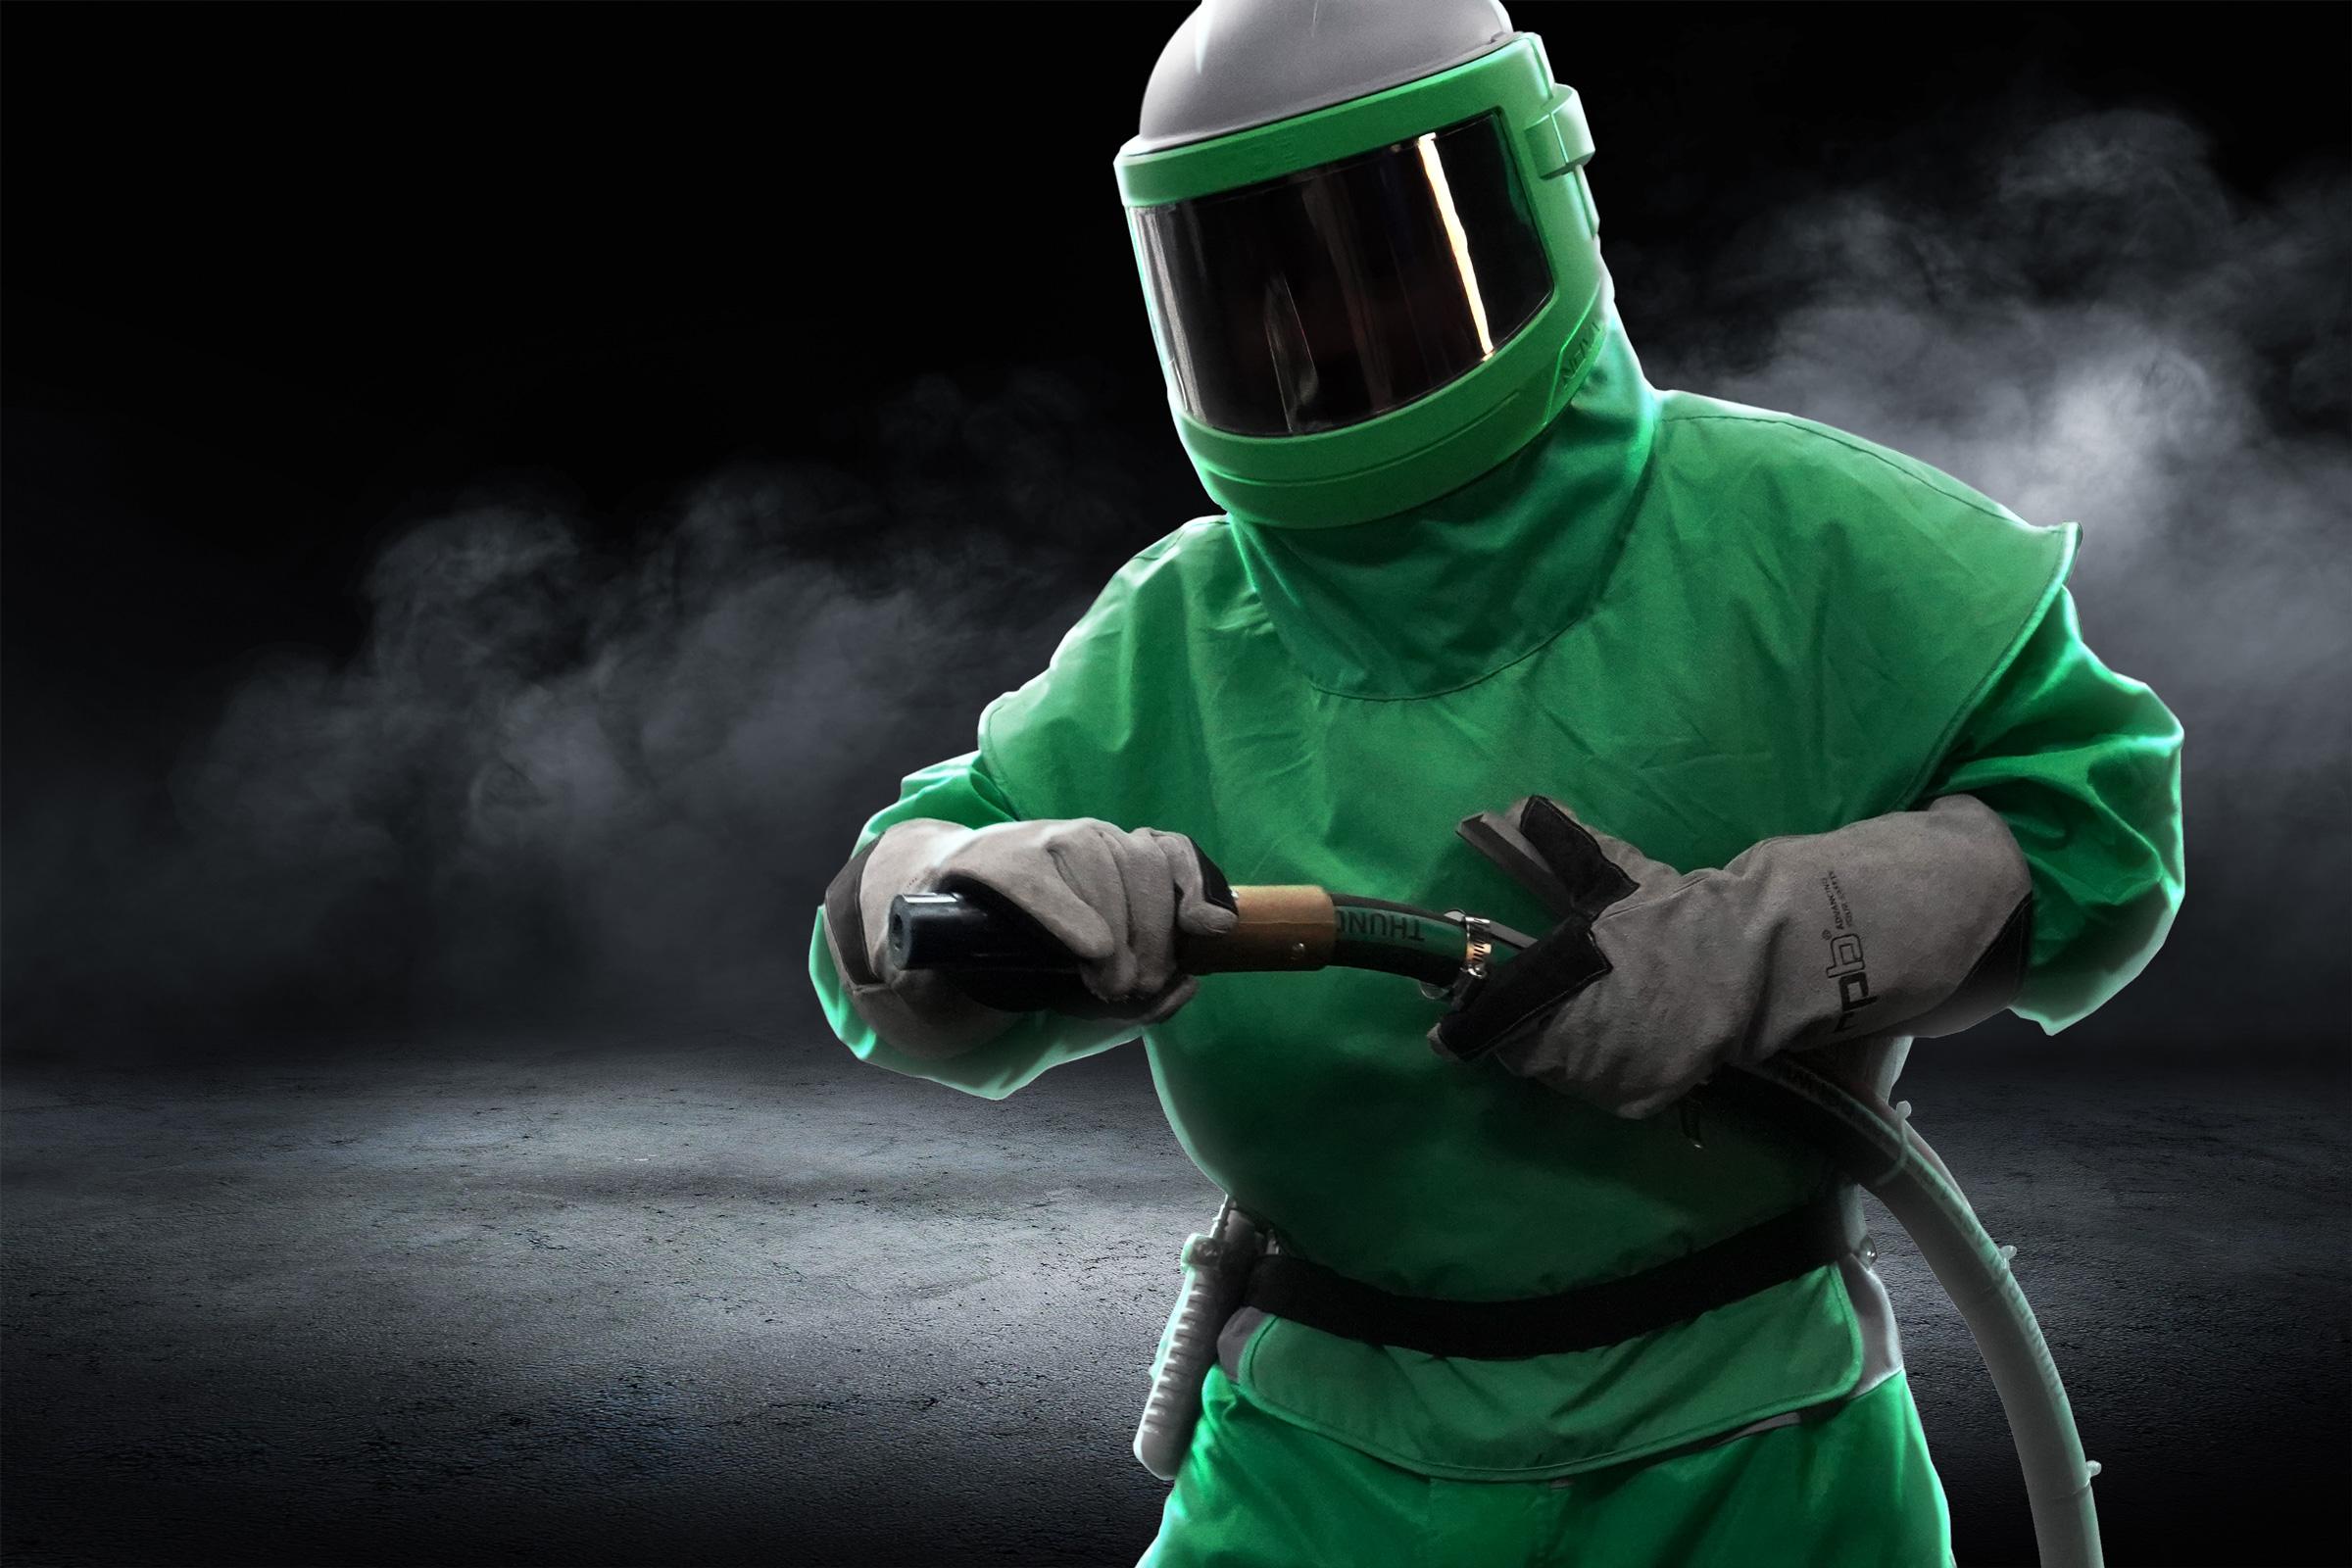 person wearing a RPB nova 3 sandblasting respirator